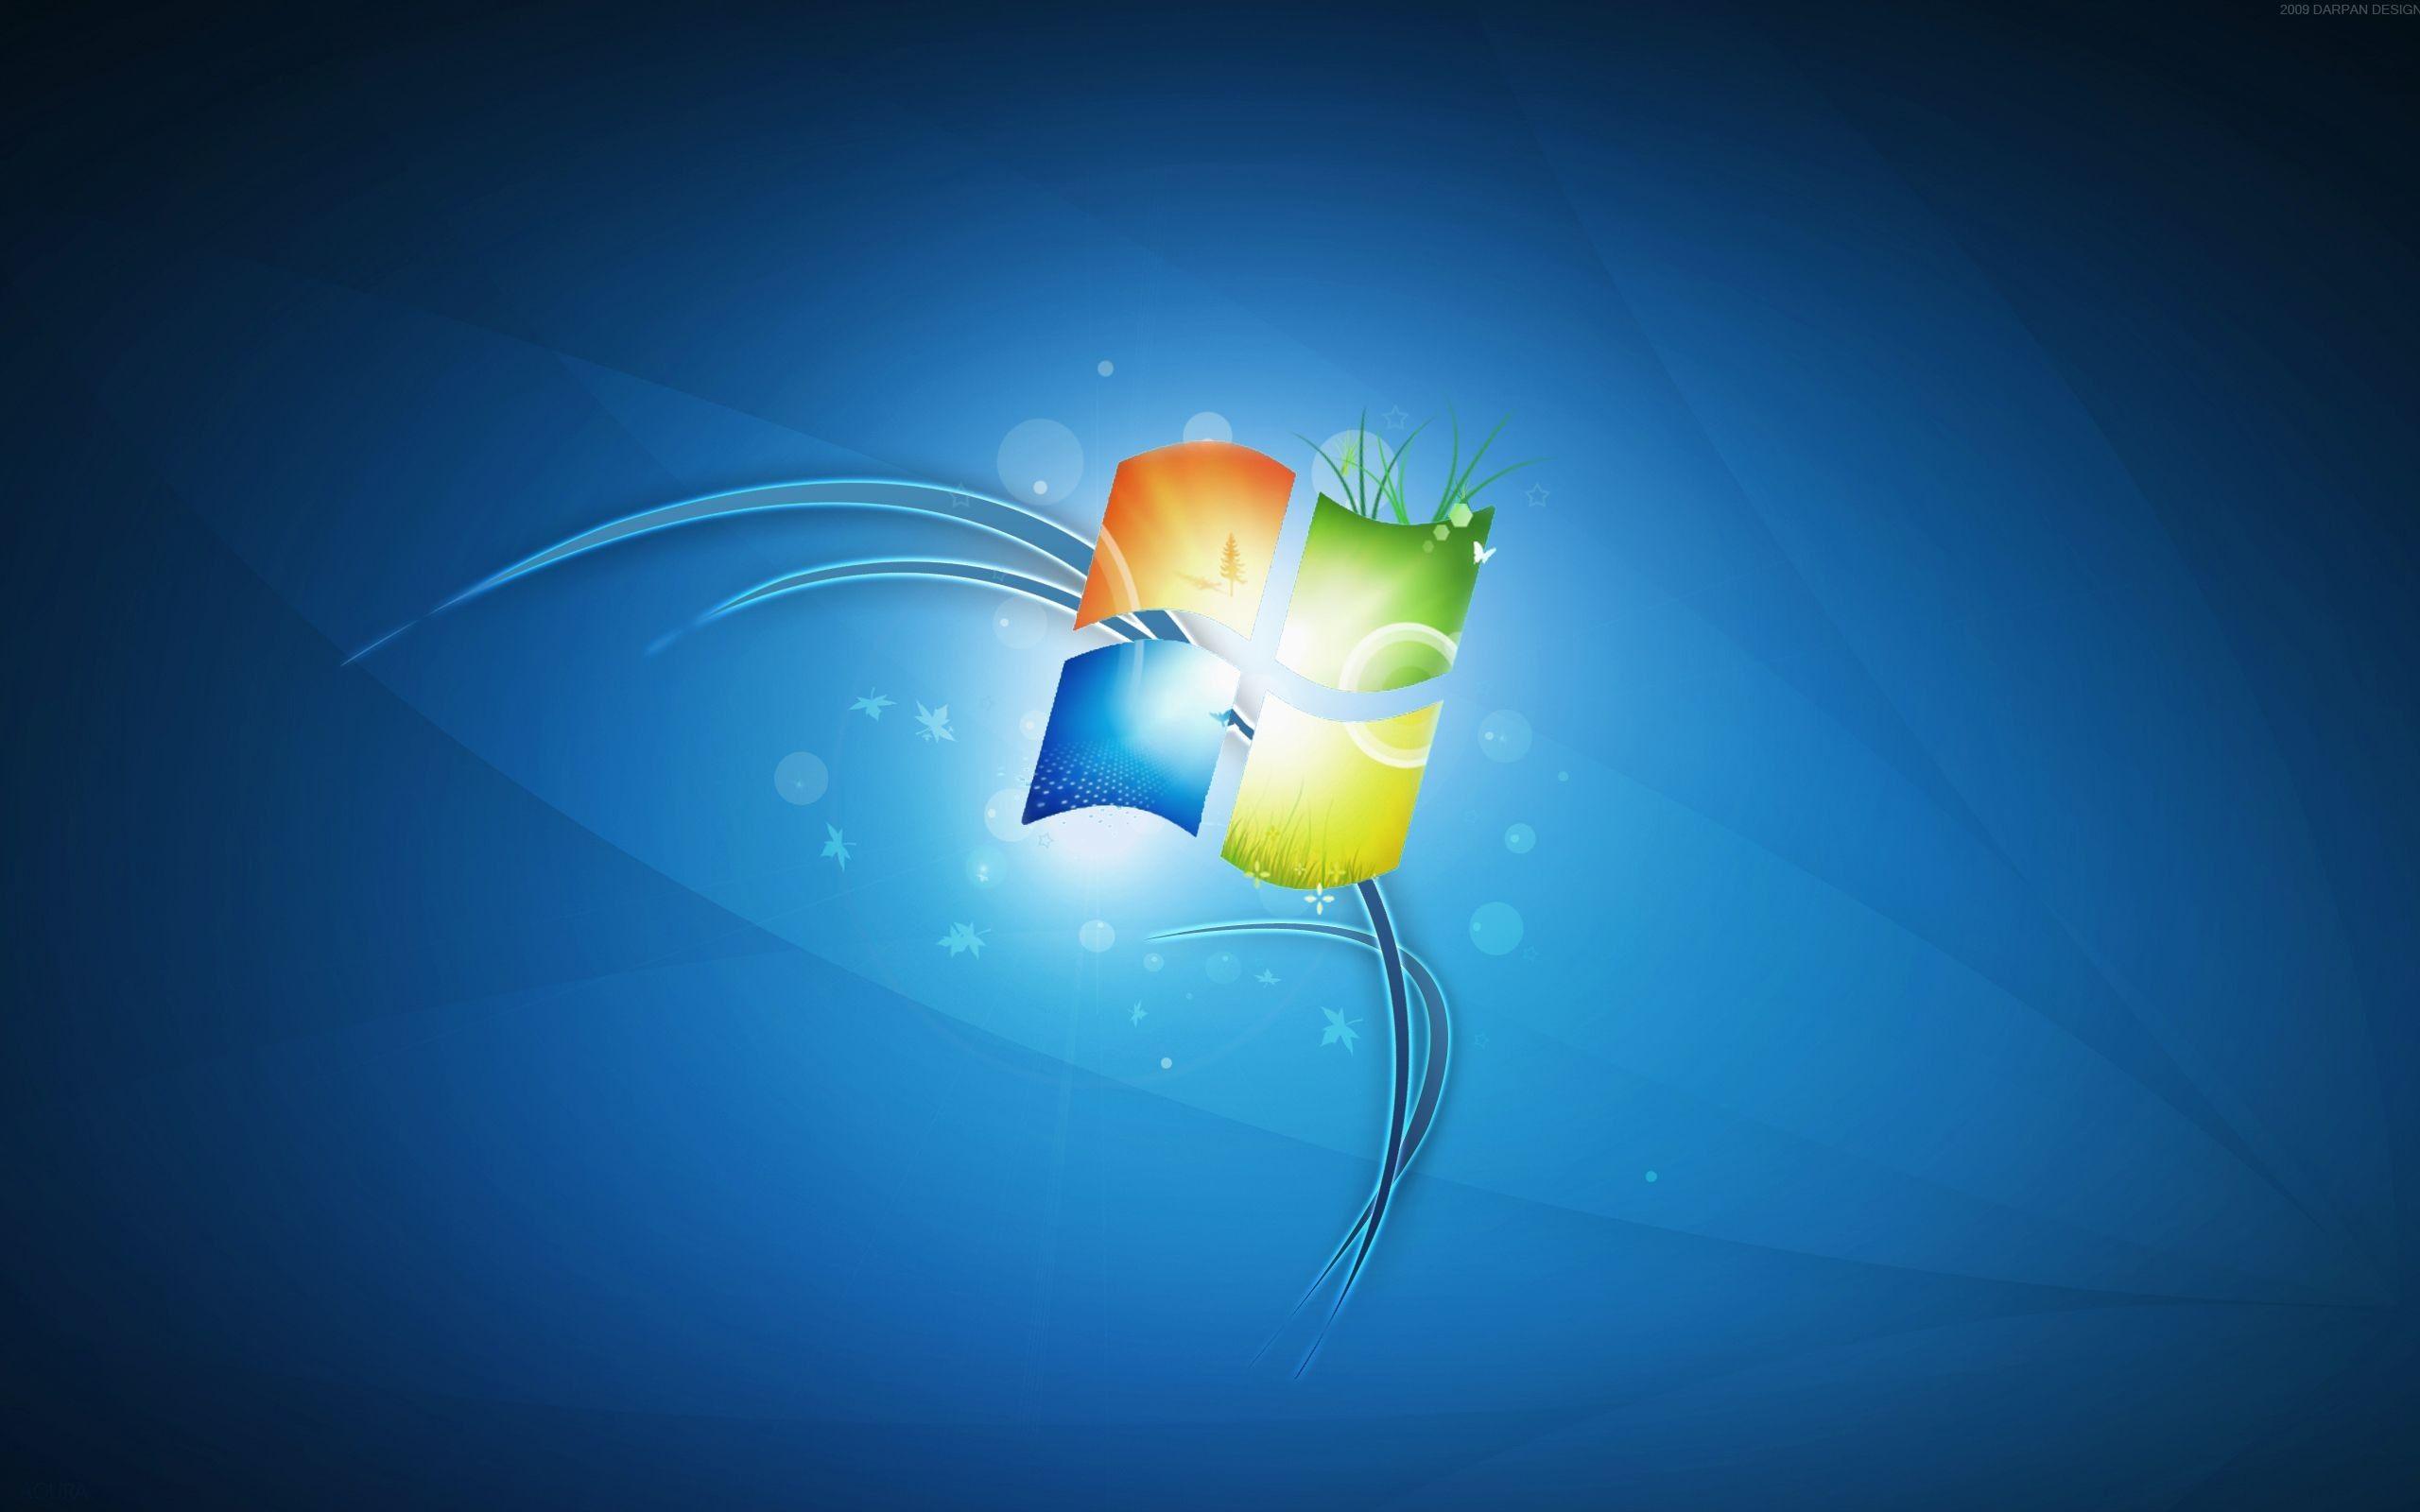 Fresh Live Horror Wallpaper For Windows 7 Di 2020 Mobil